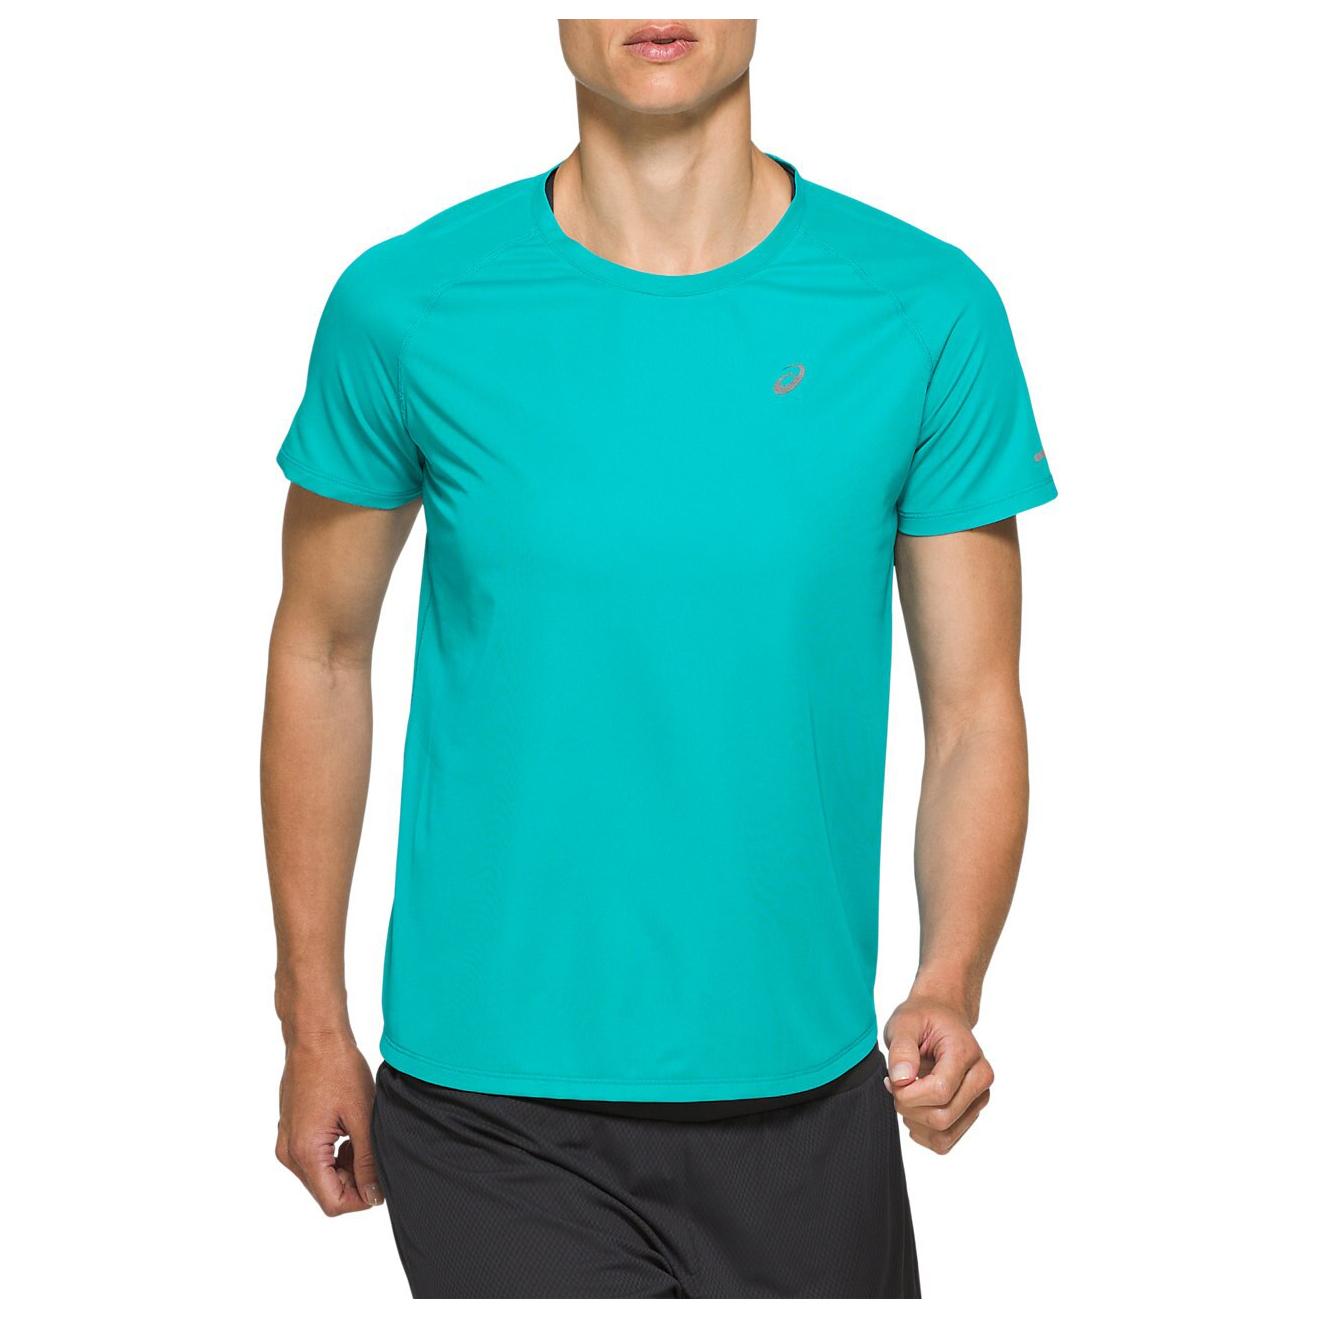 Asics - Women's Ventilate S/S Top - Running shirt - Lagoon | XS